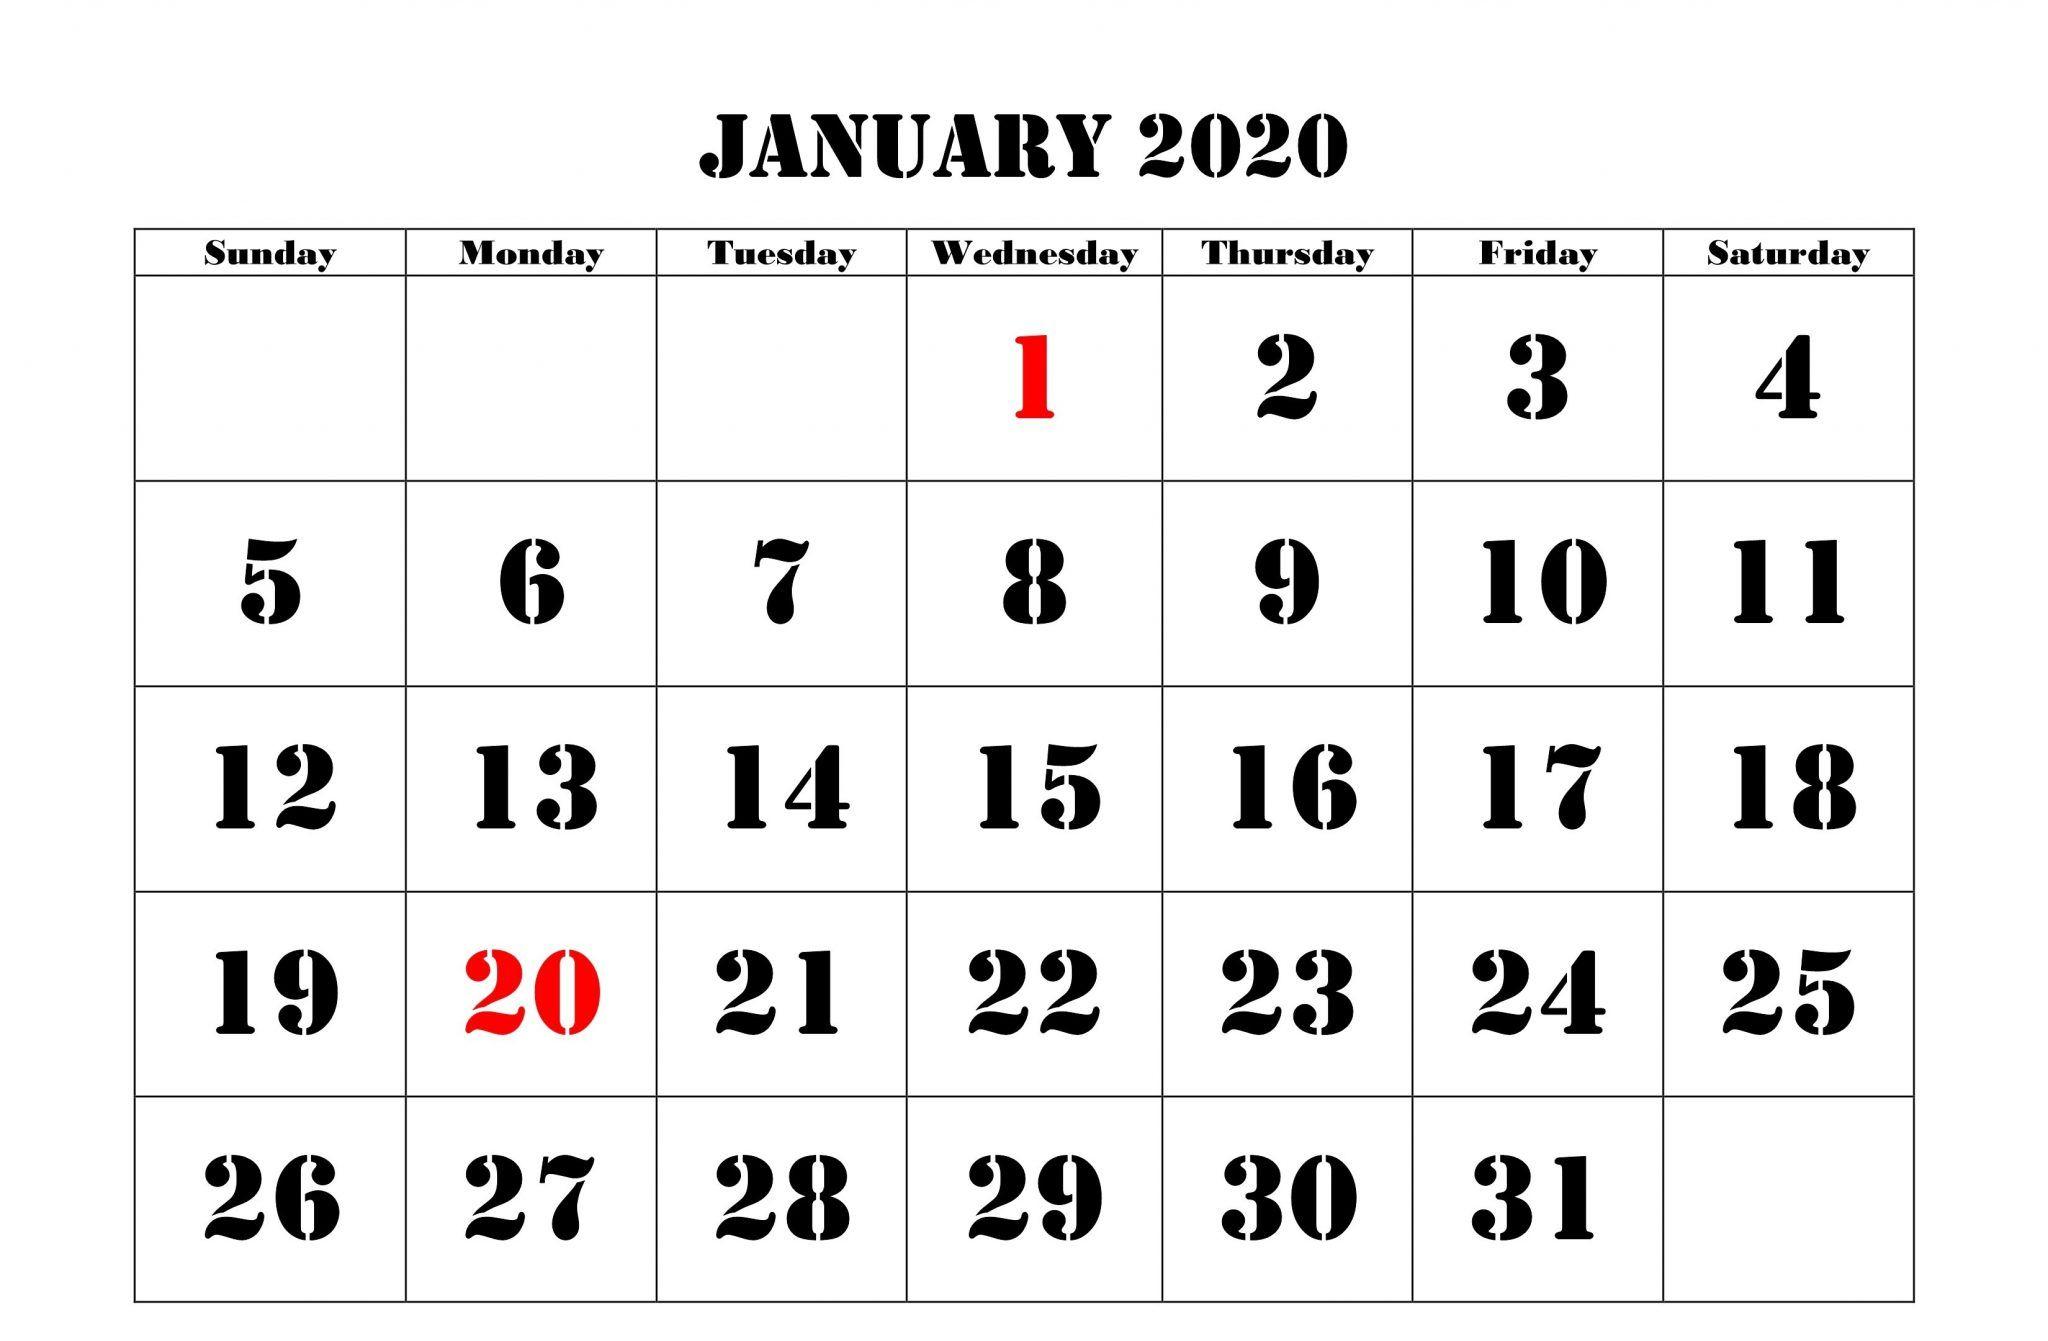 January 2020 Calendar Holidays Canada | Holiday Calendar